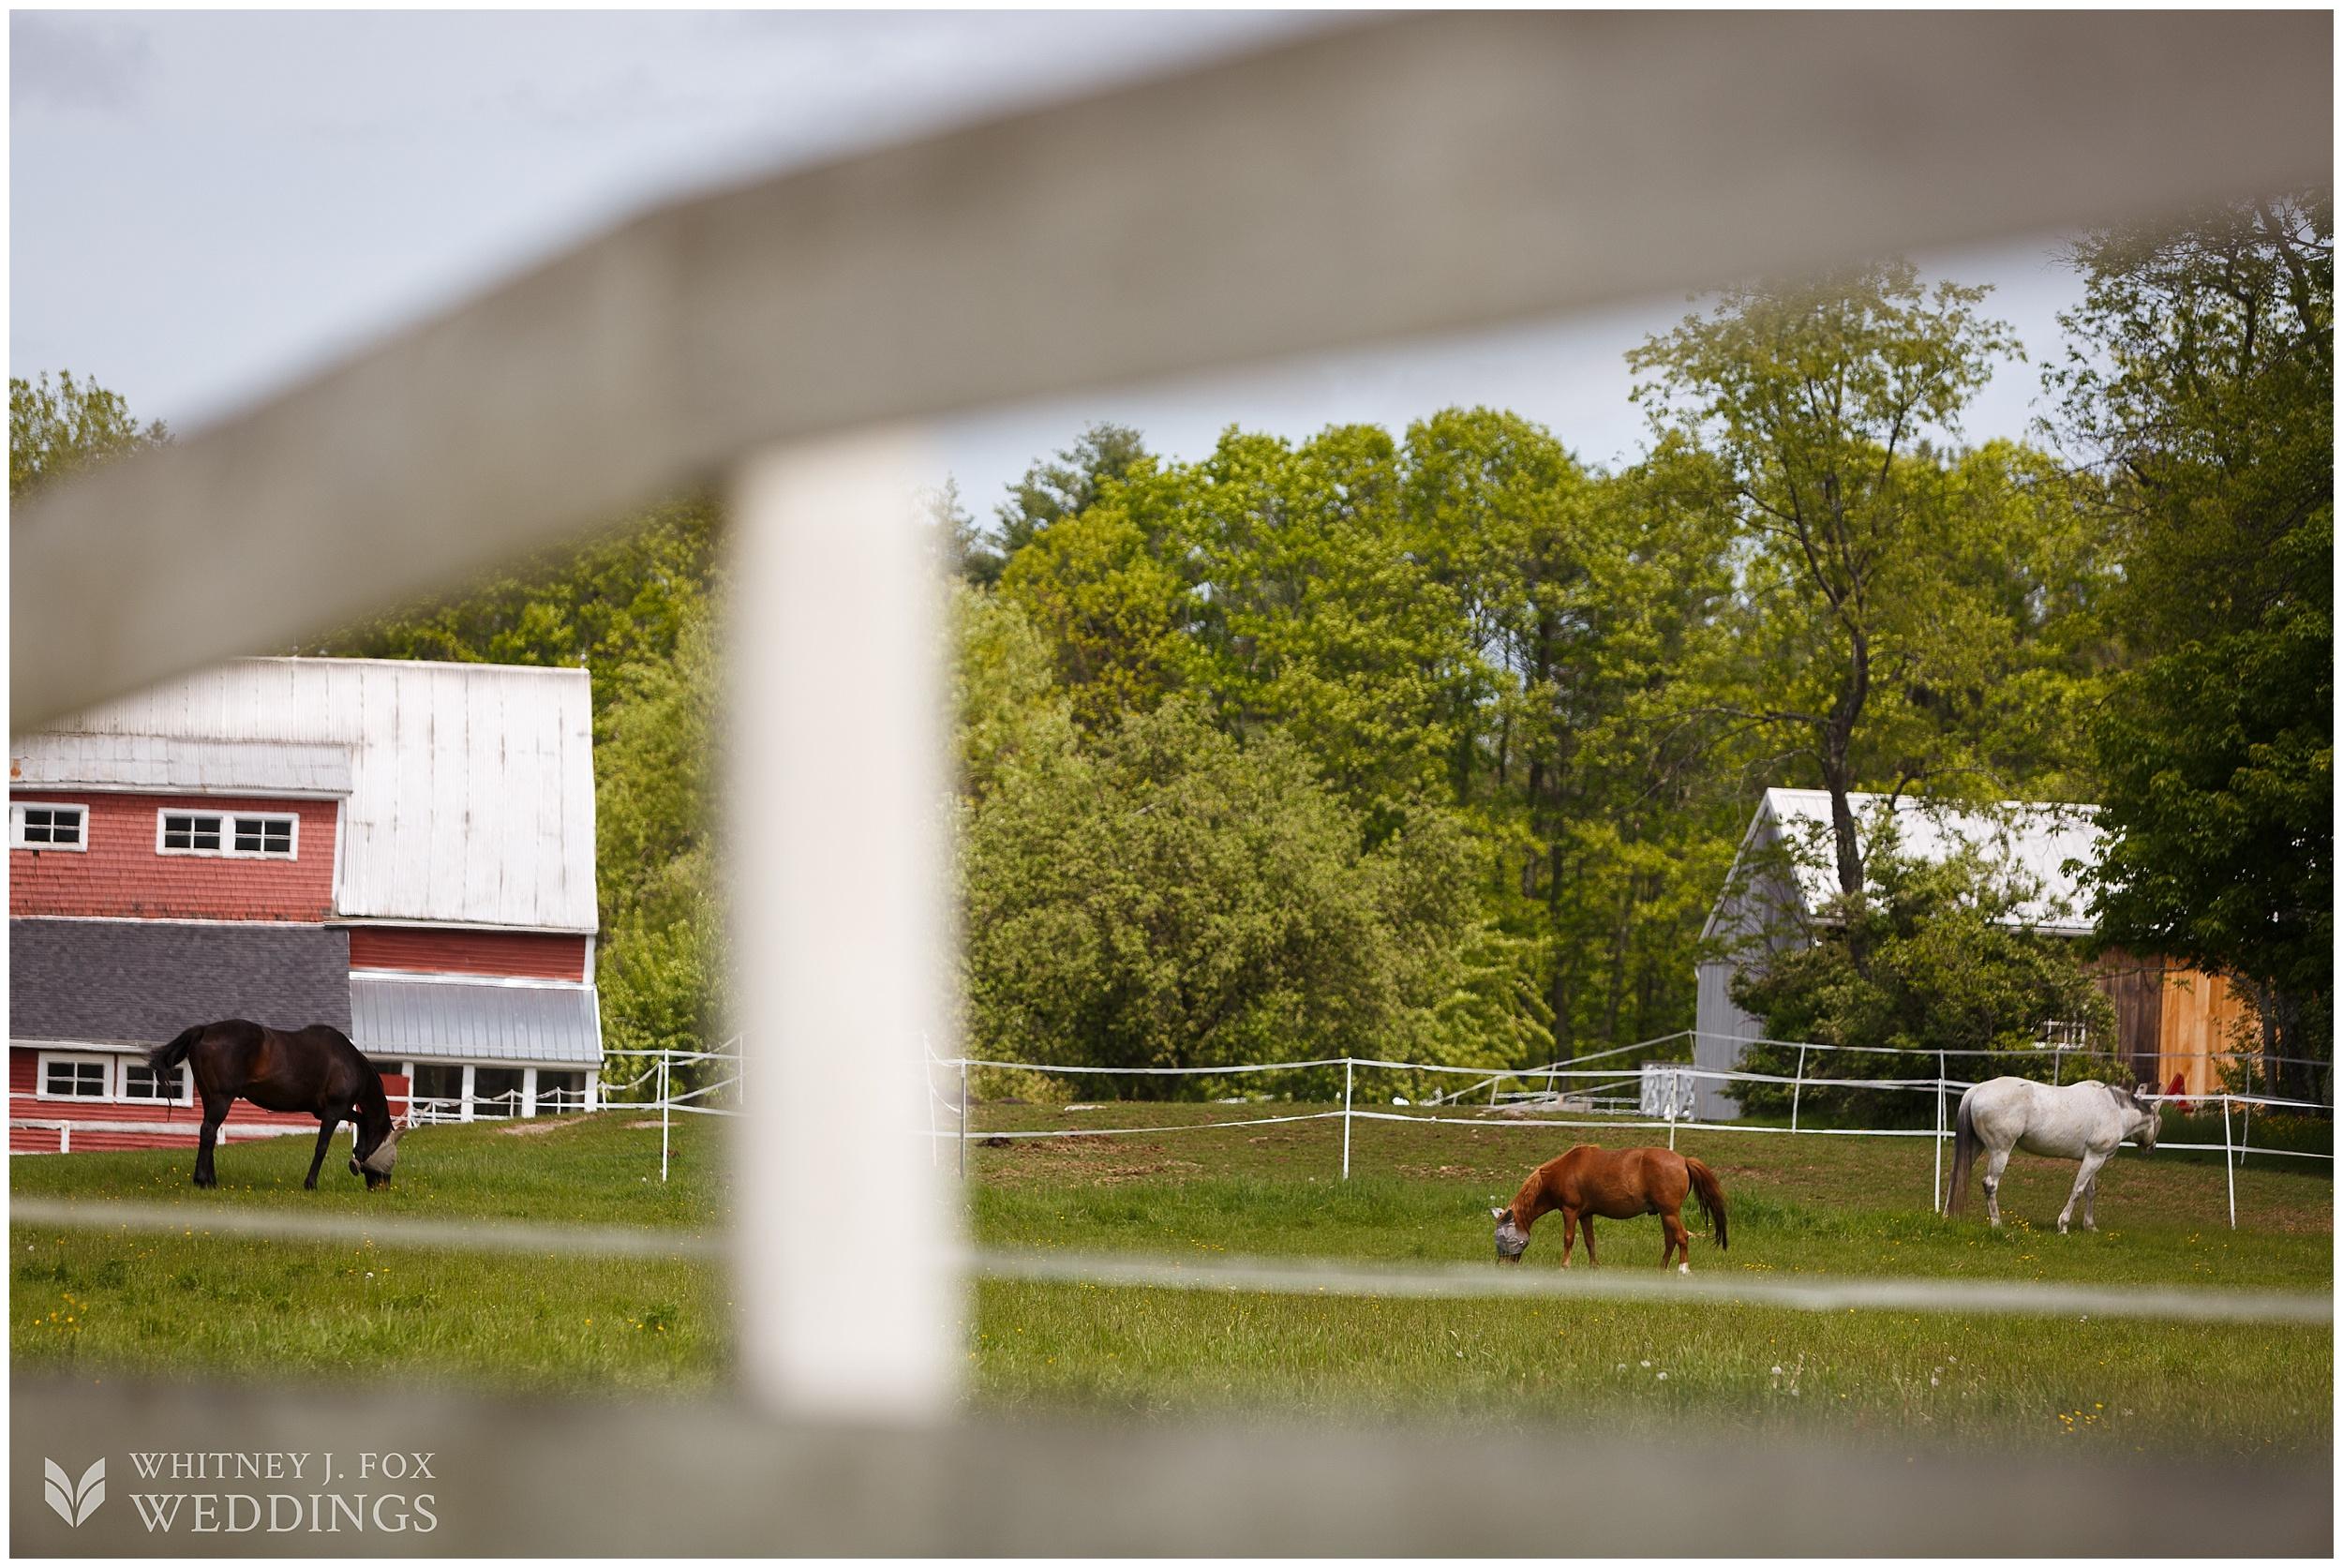 1_2_tai_josh_the_homestead_rest_be_thankful_farm_lyman_maine_photographer_whitney_j_fox_weddings_0630.jpg